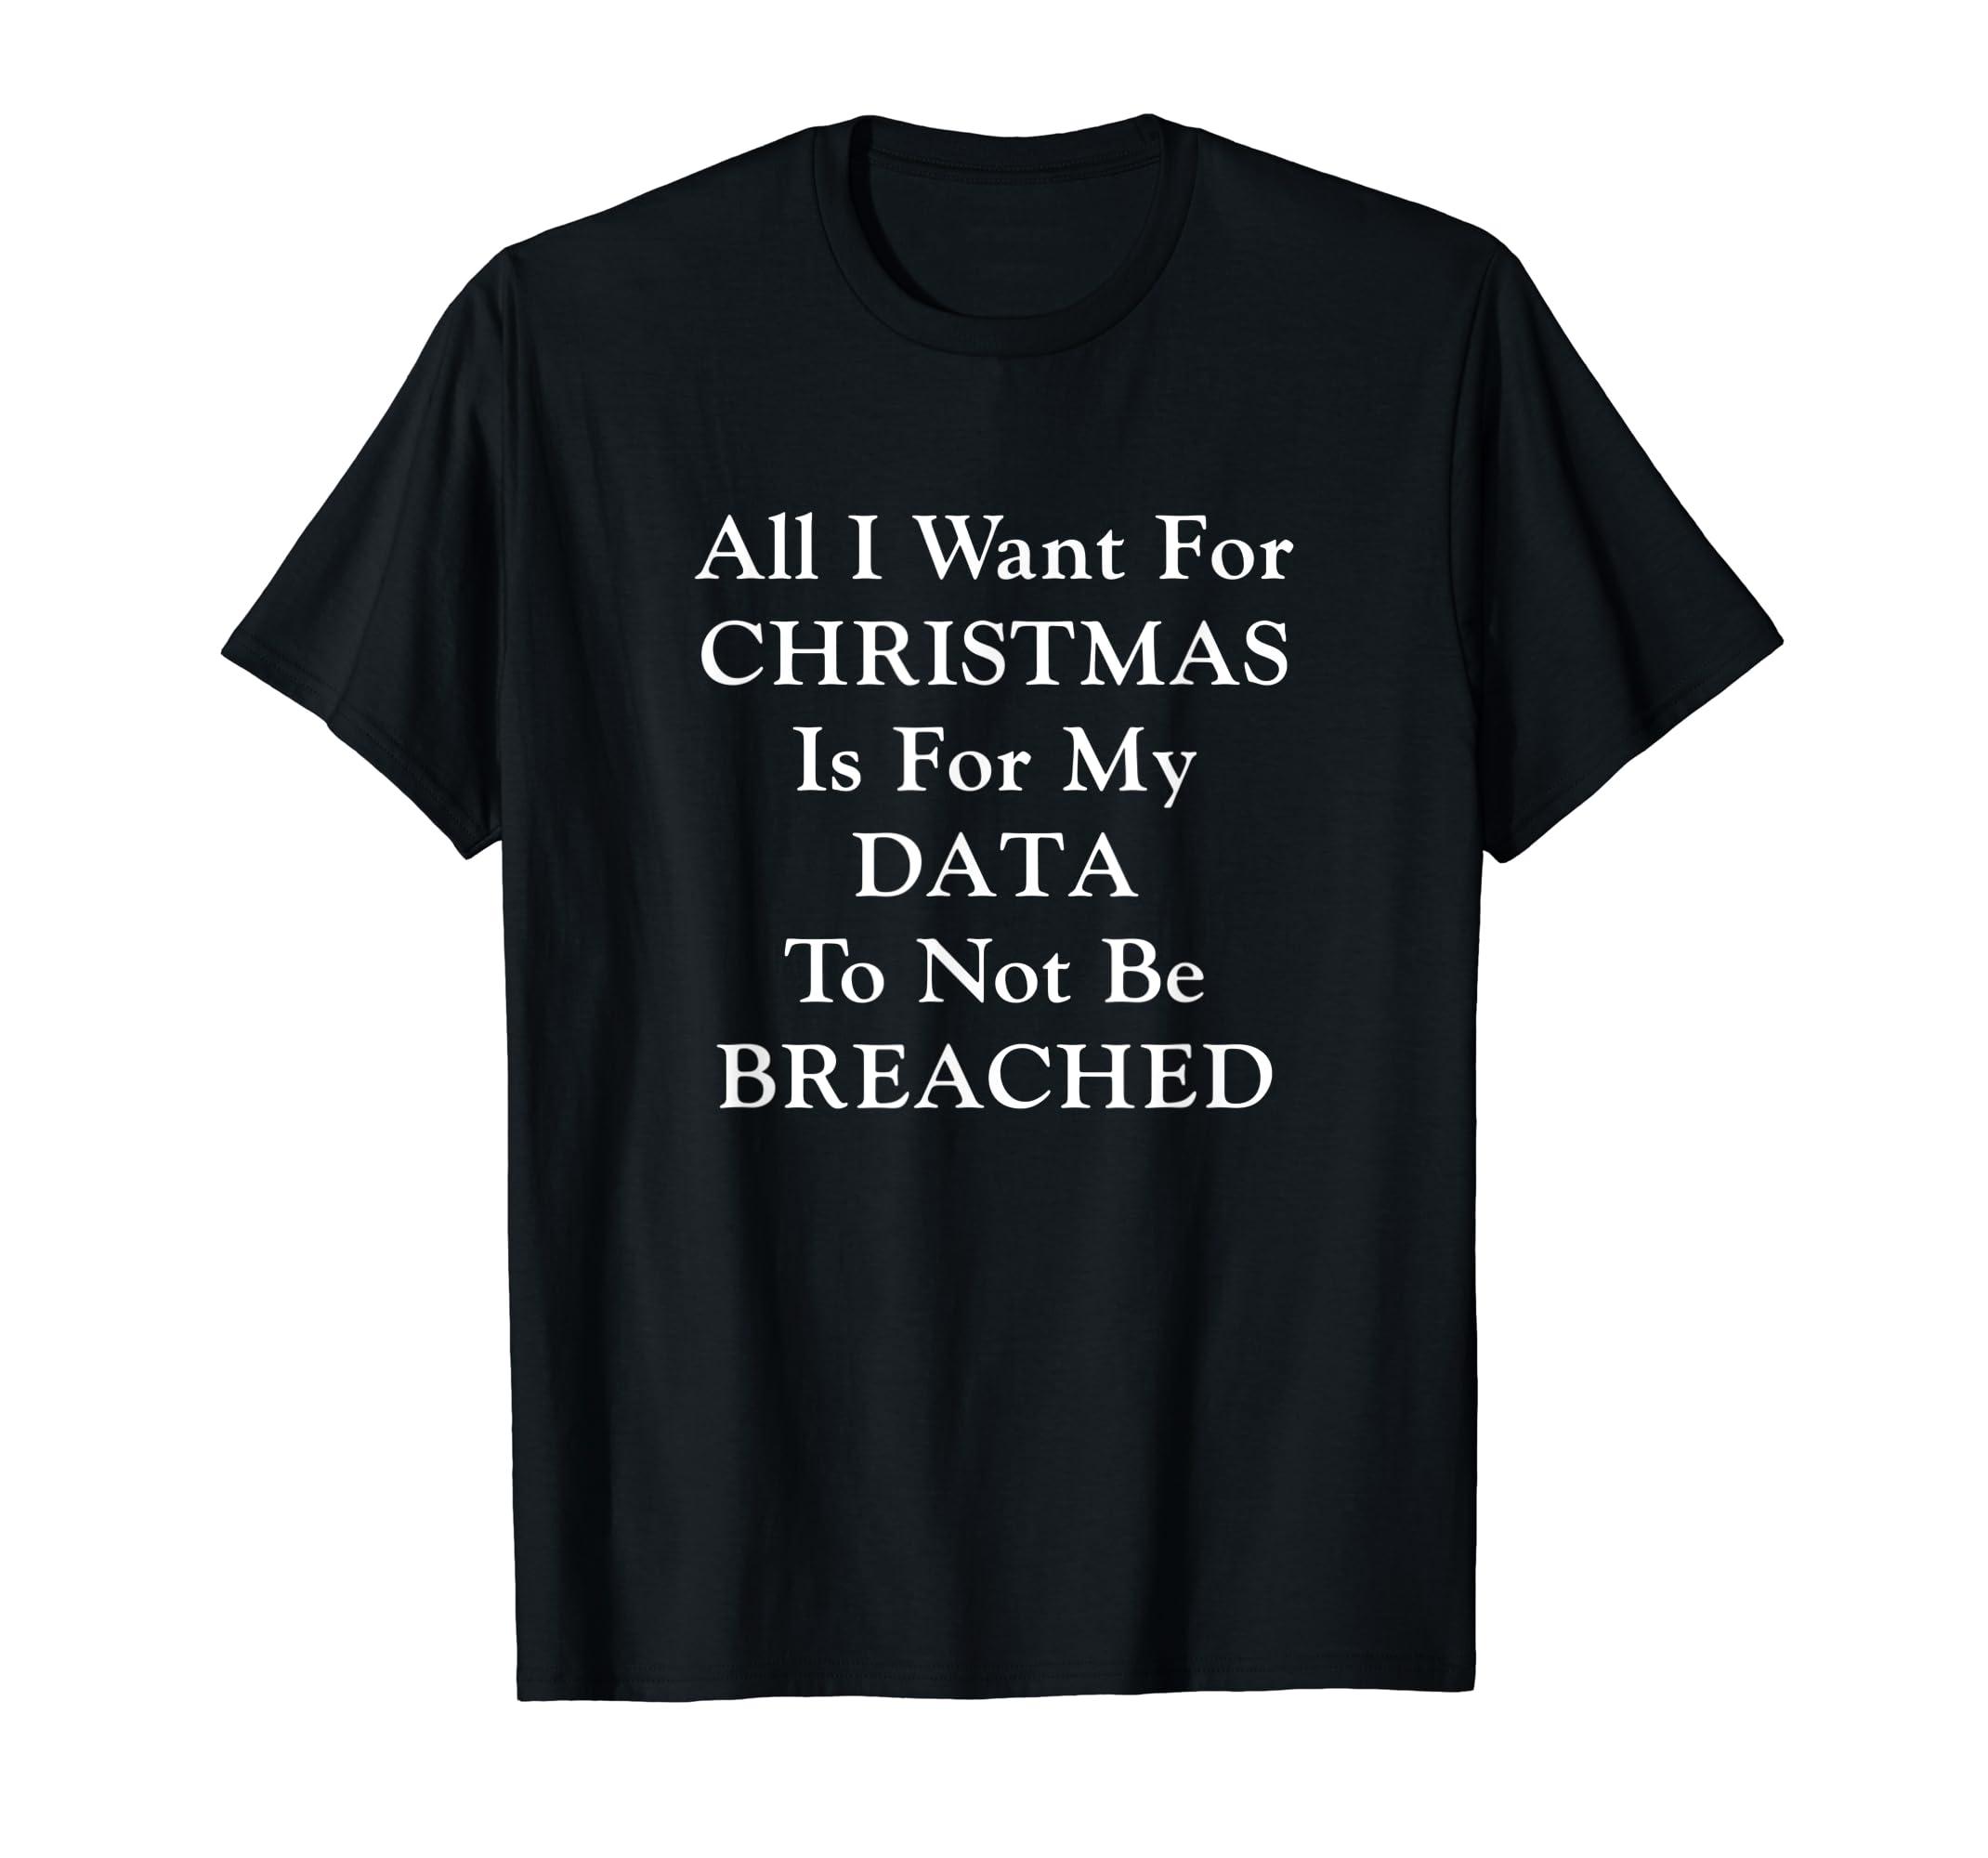 Data Breach Funny Privacy Christmas Wish List T-Shirt-Men's T-Shirt-Black